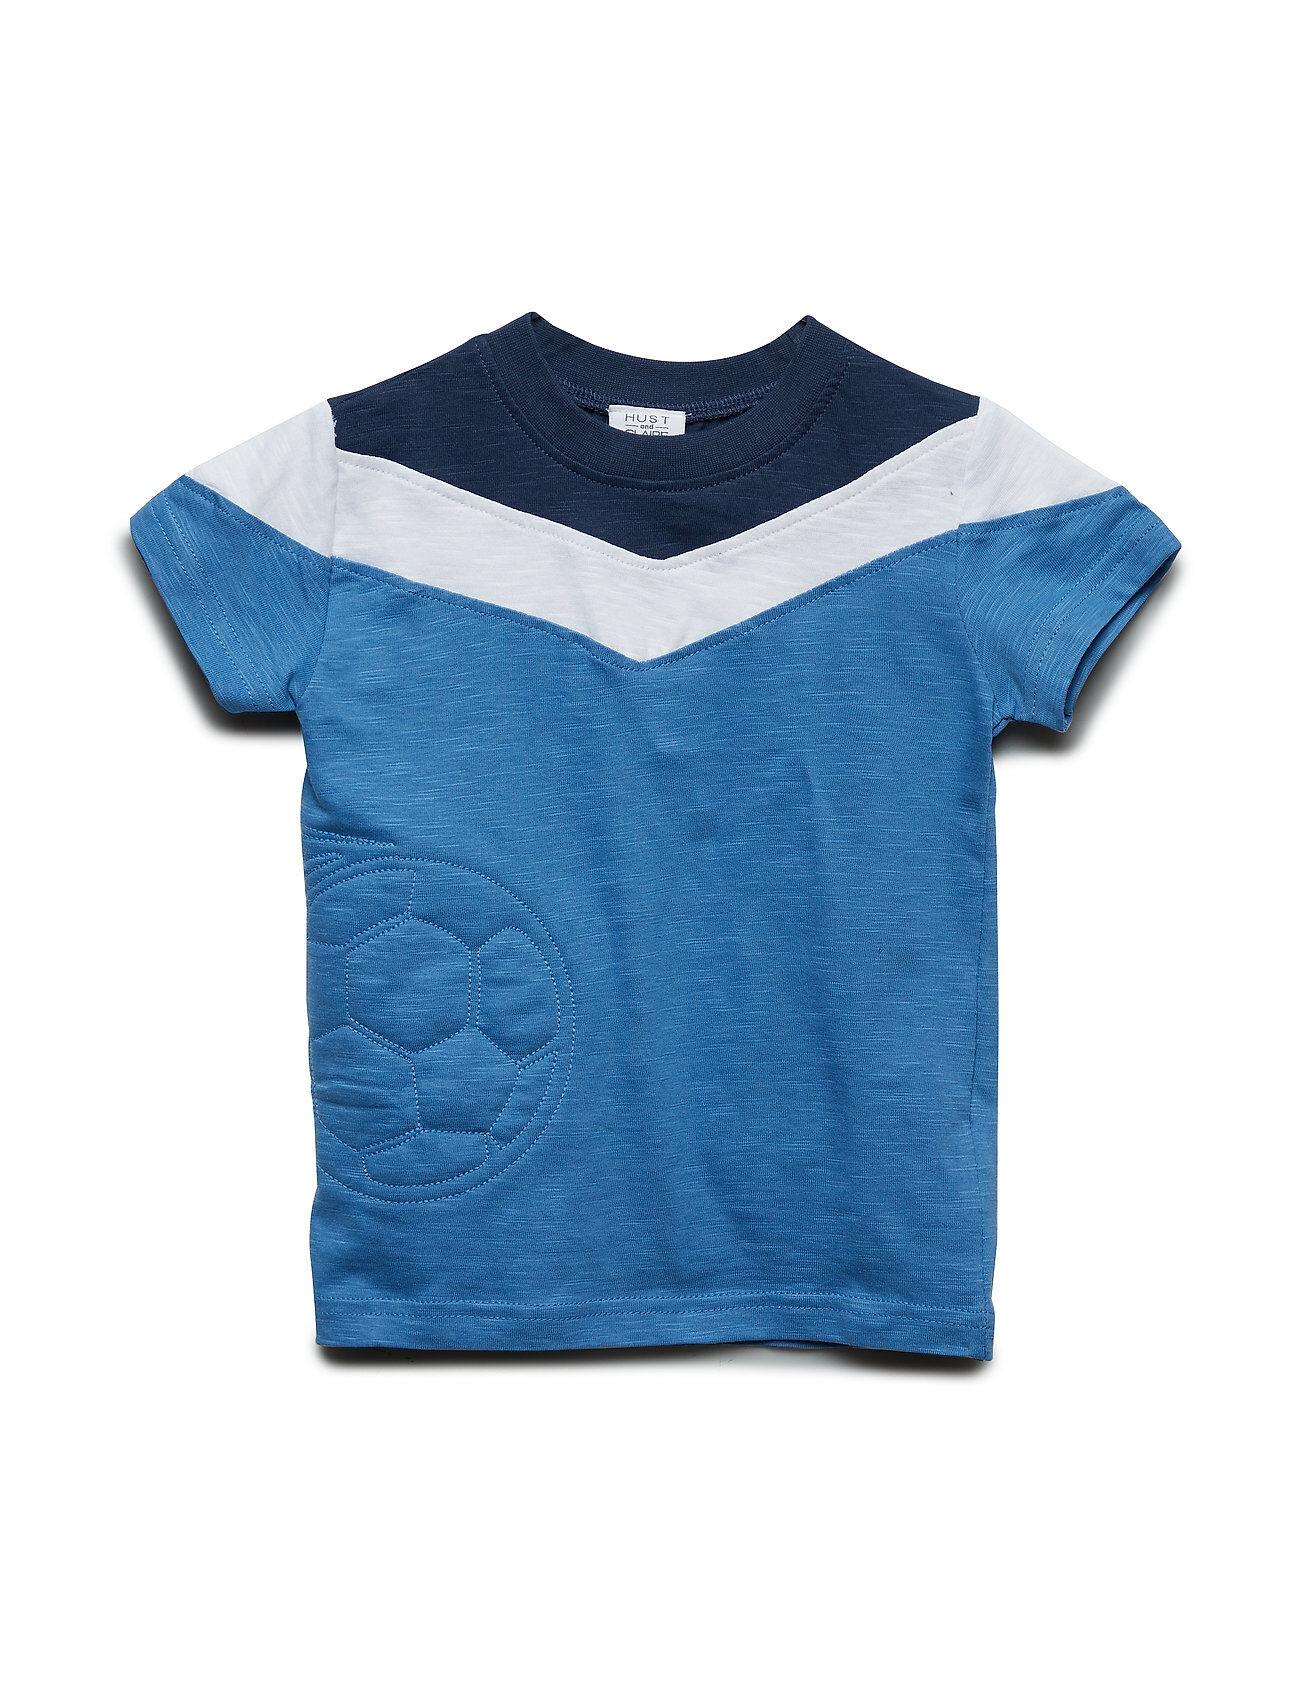 Hust & Claire Arthur - T-Shirt S/S T-shirts Short-sleeved Sininen Hust & Claire